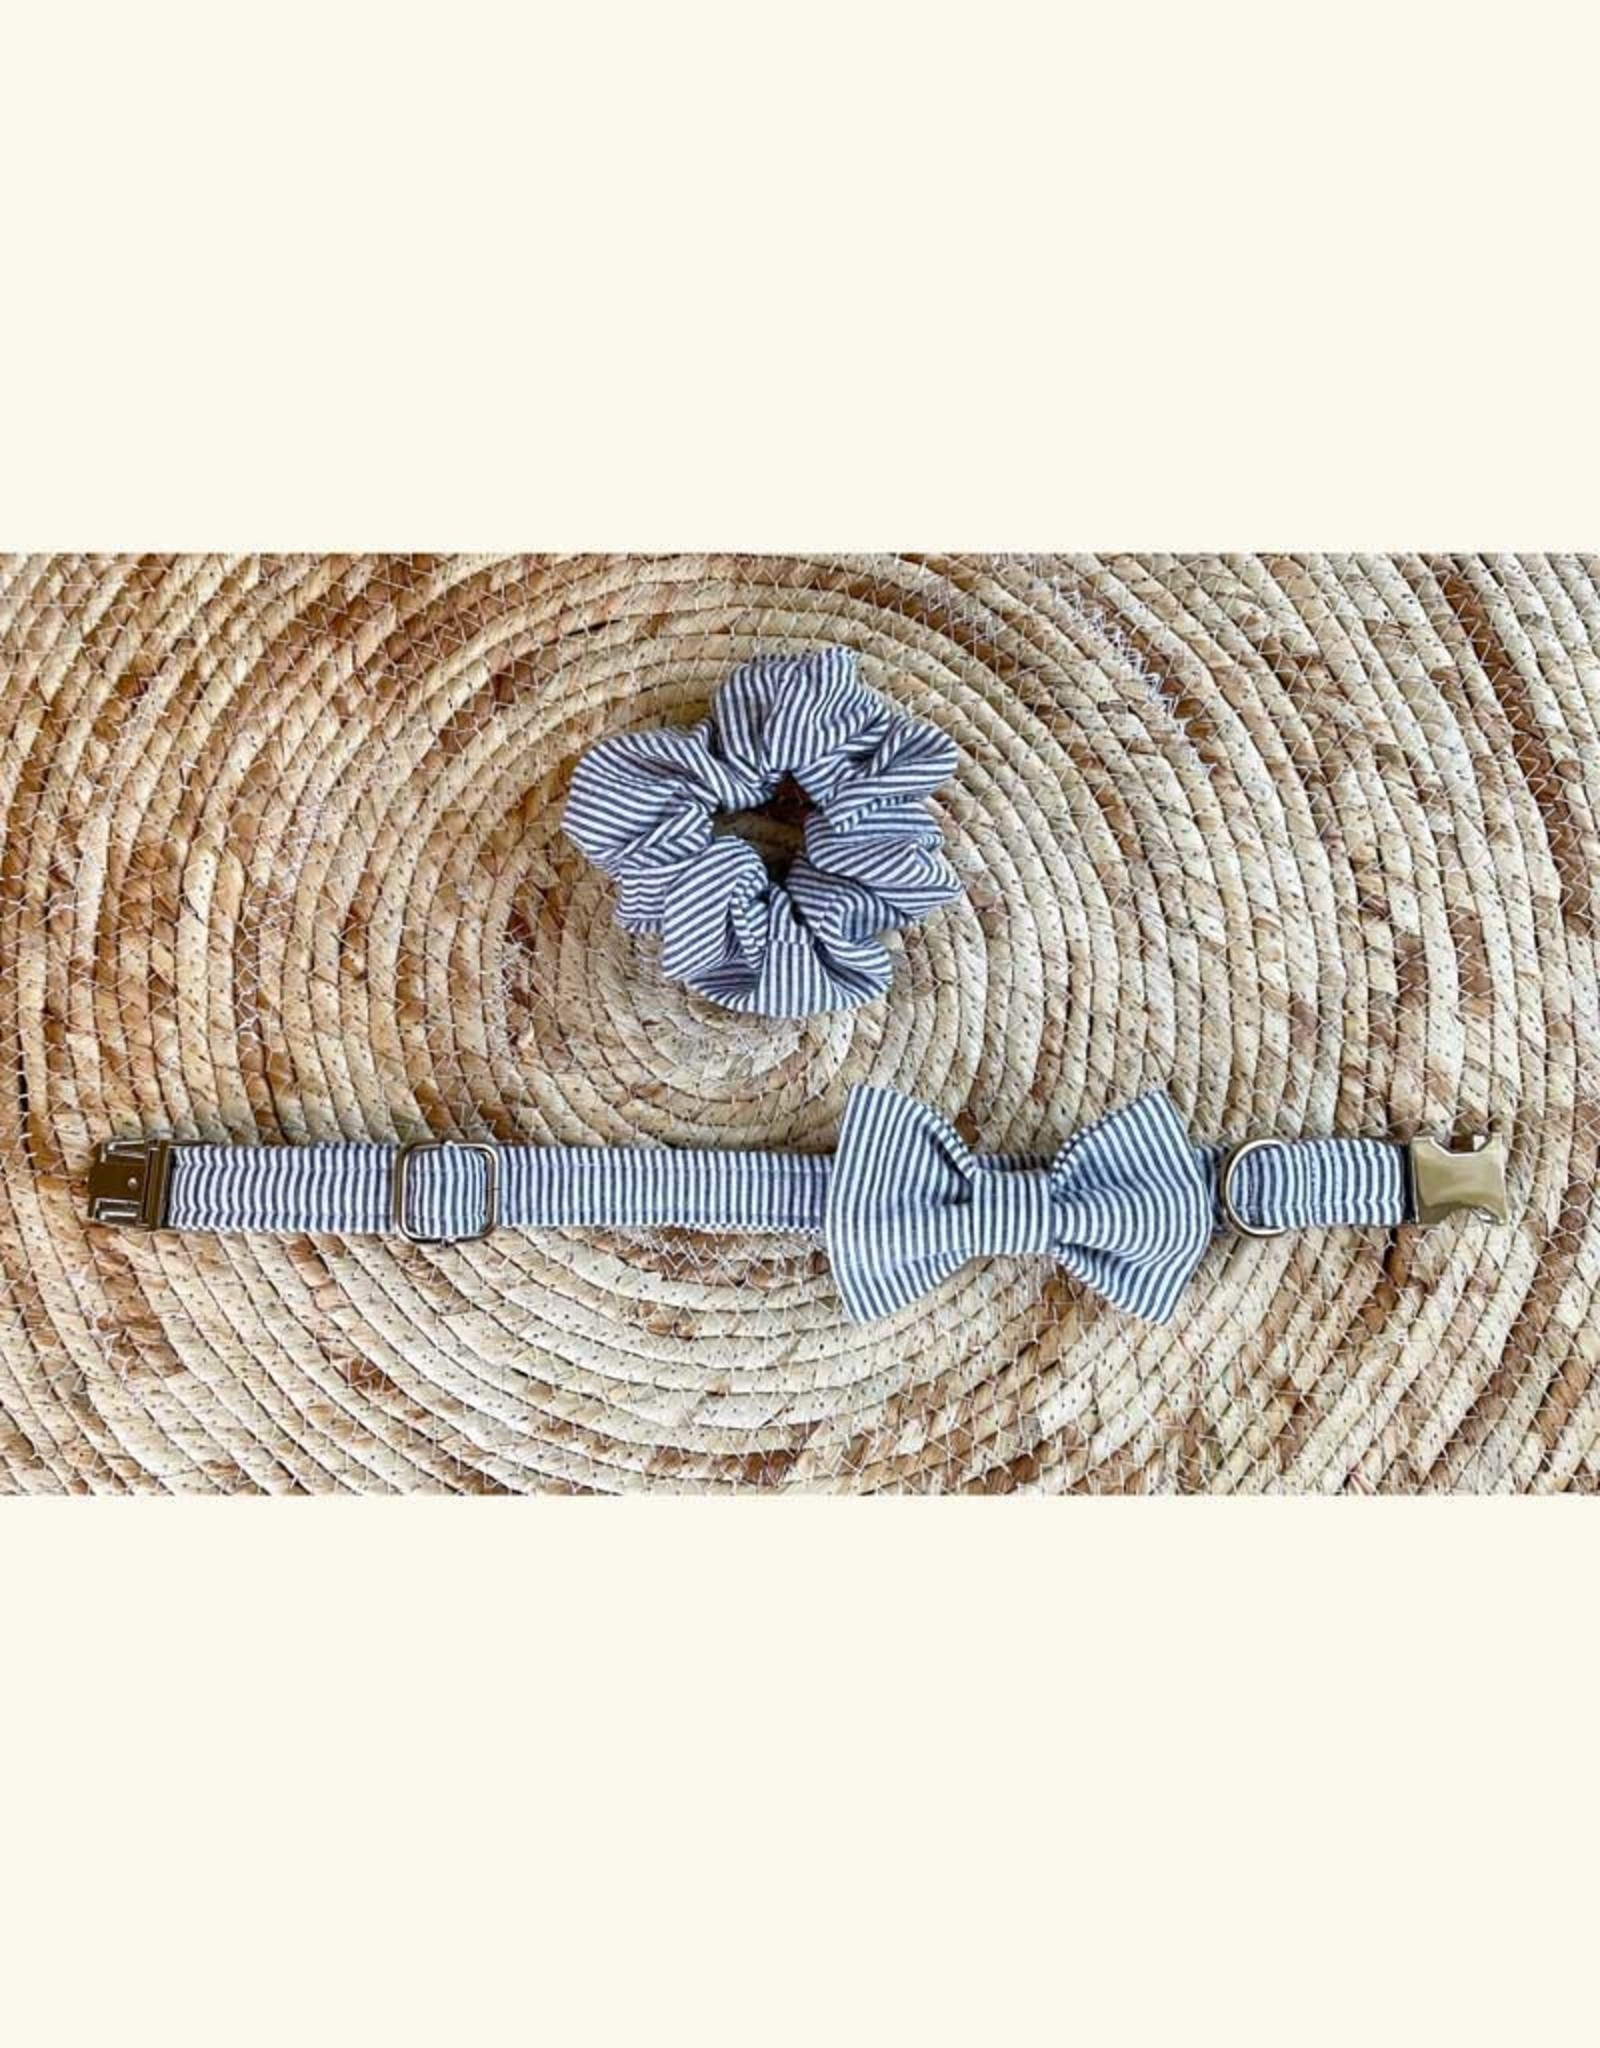 Halsband | Grijs-blauw Streepje